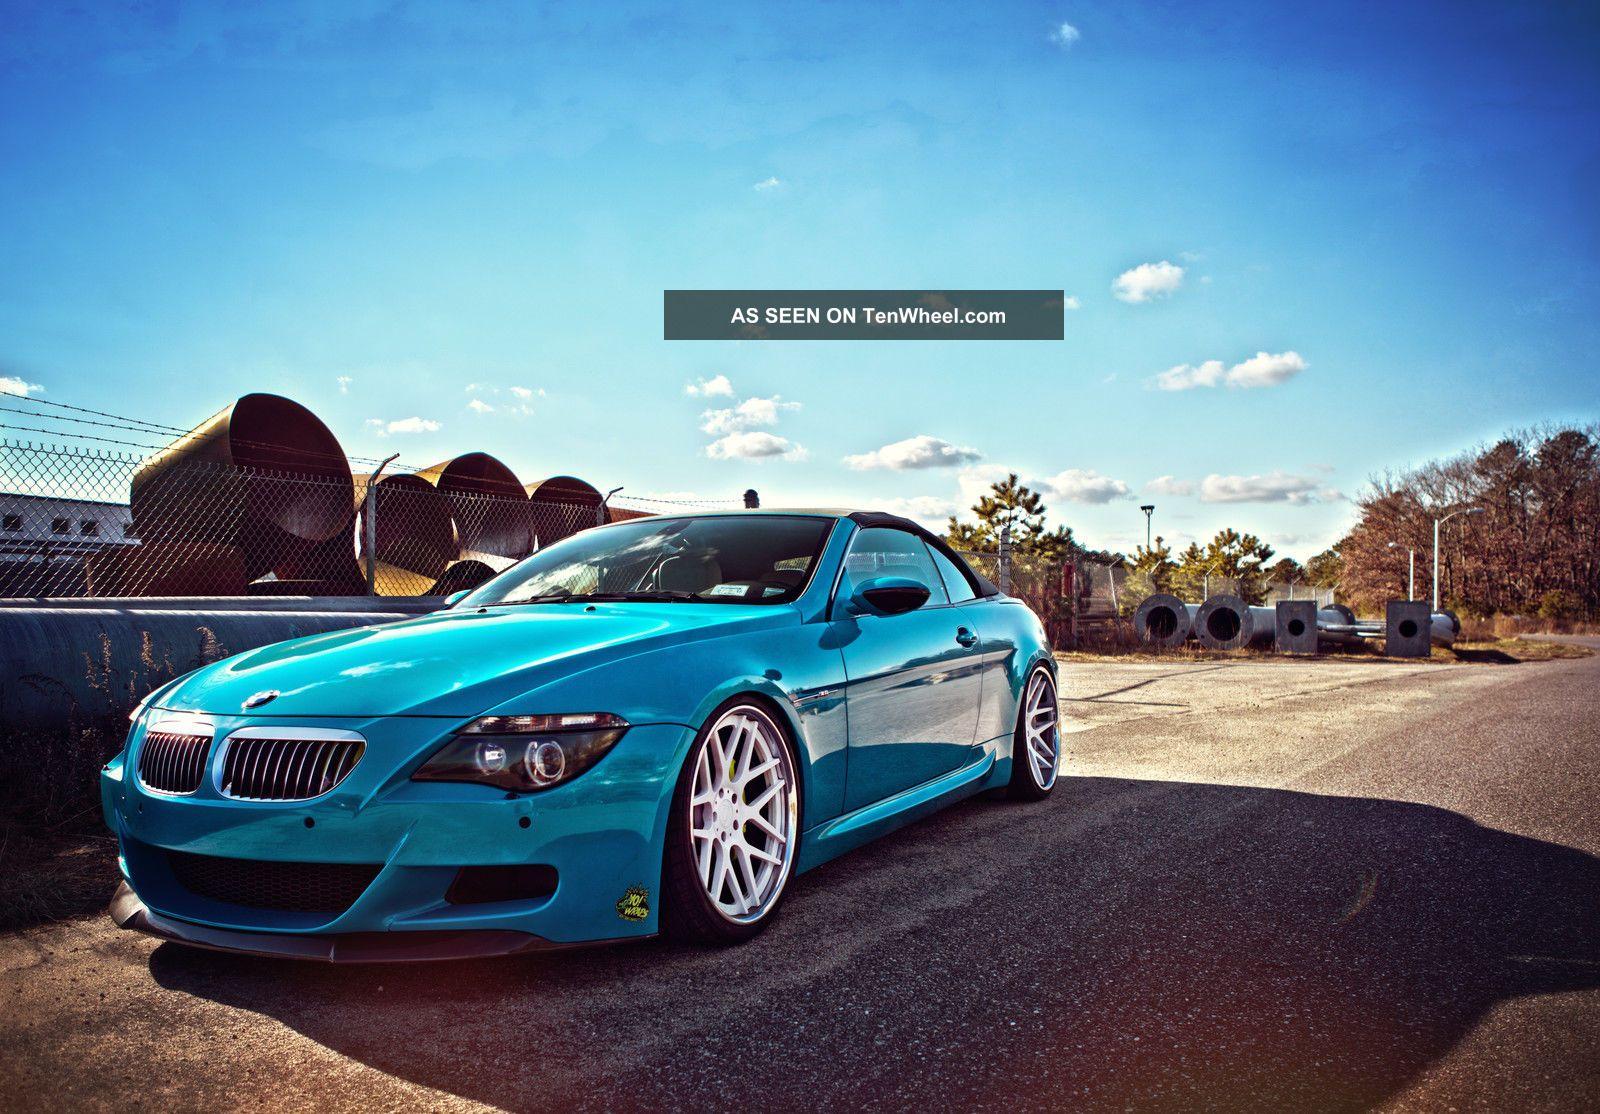 2007 Bmw M6 Convertible Custom Show Car Choose Your Color M6 photo